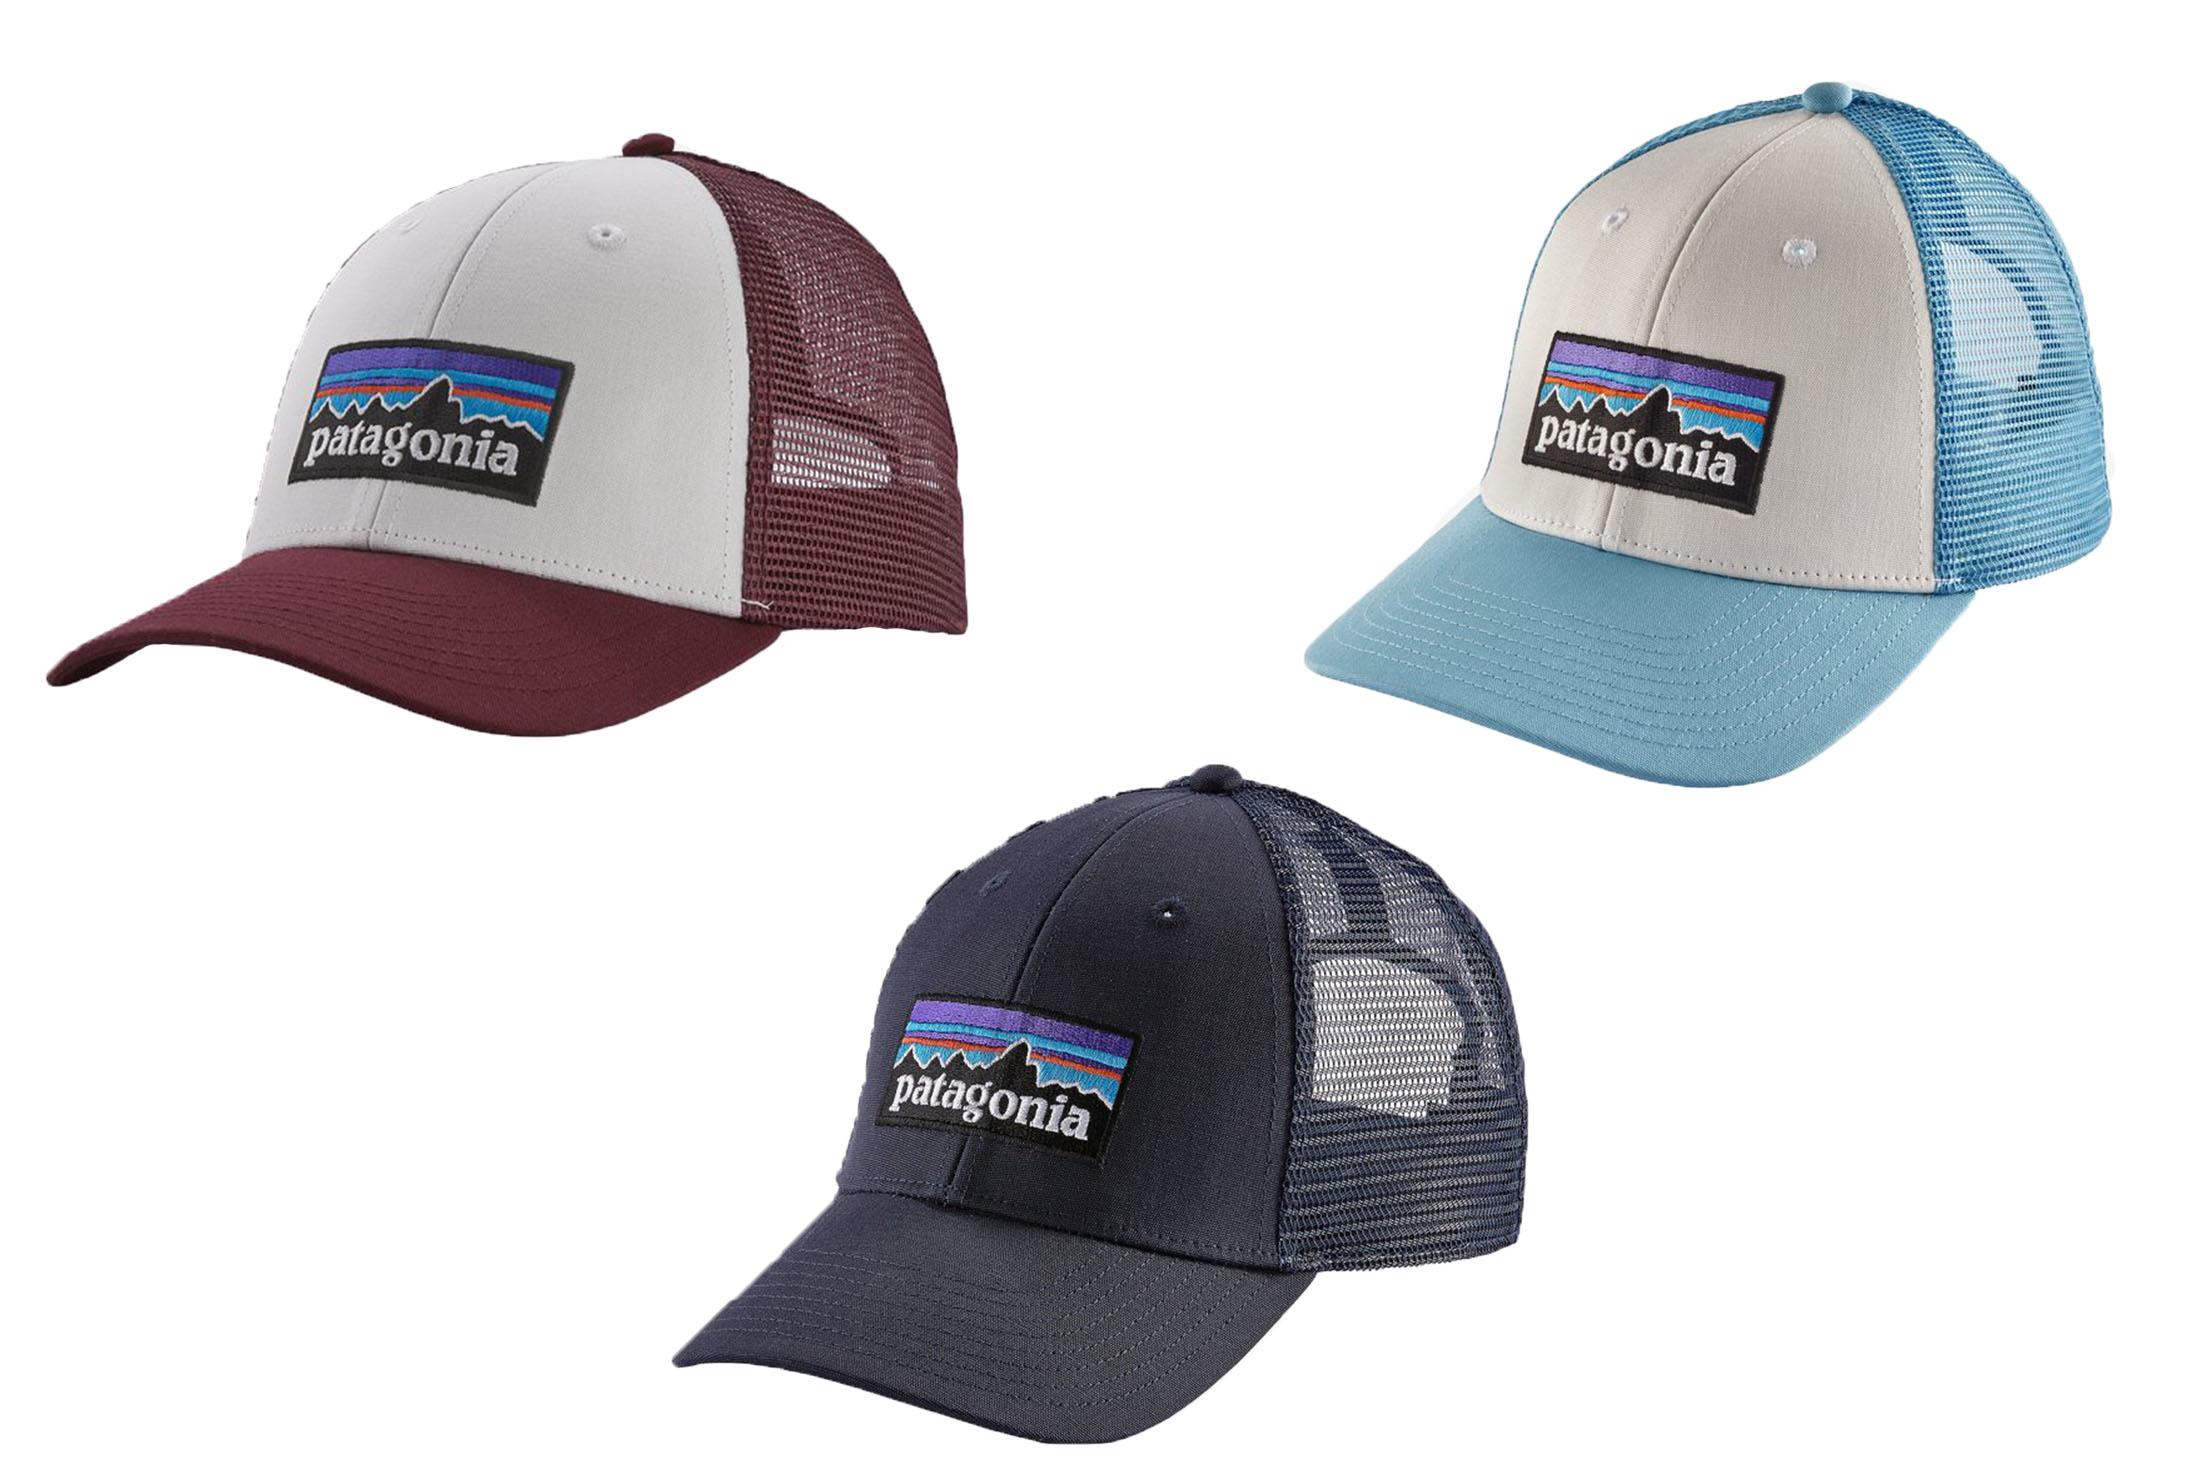 3 patagonia hats